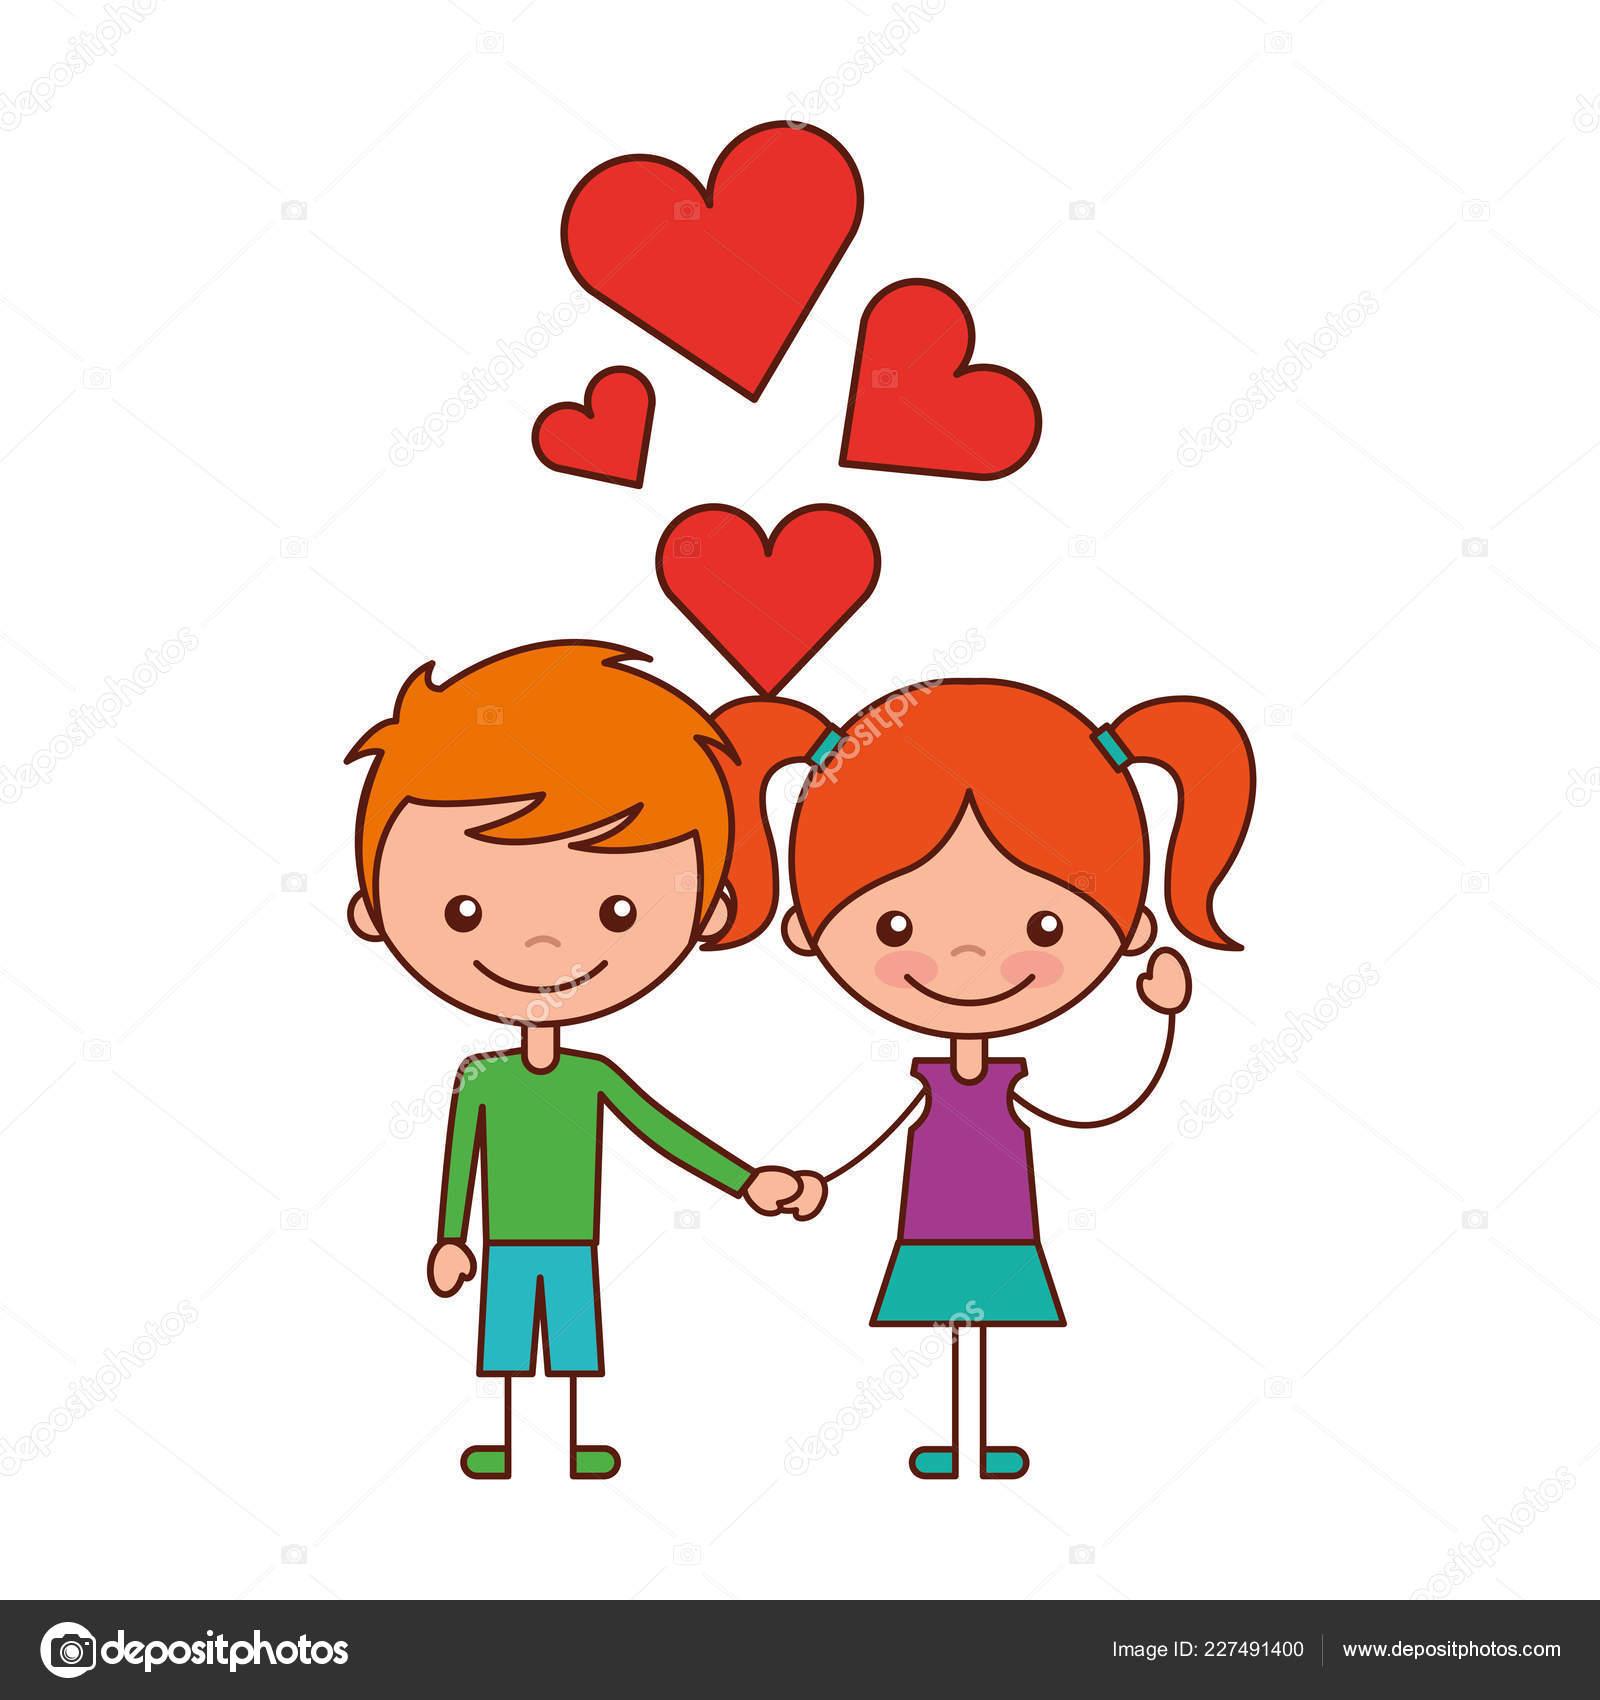 Boy and girl love hearts cartoon vector illustration stock illustration